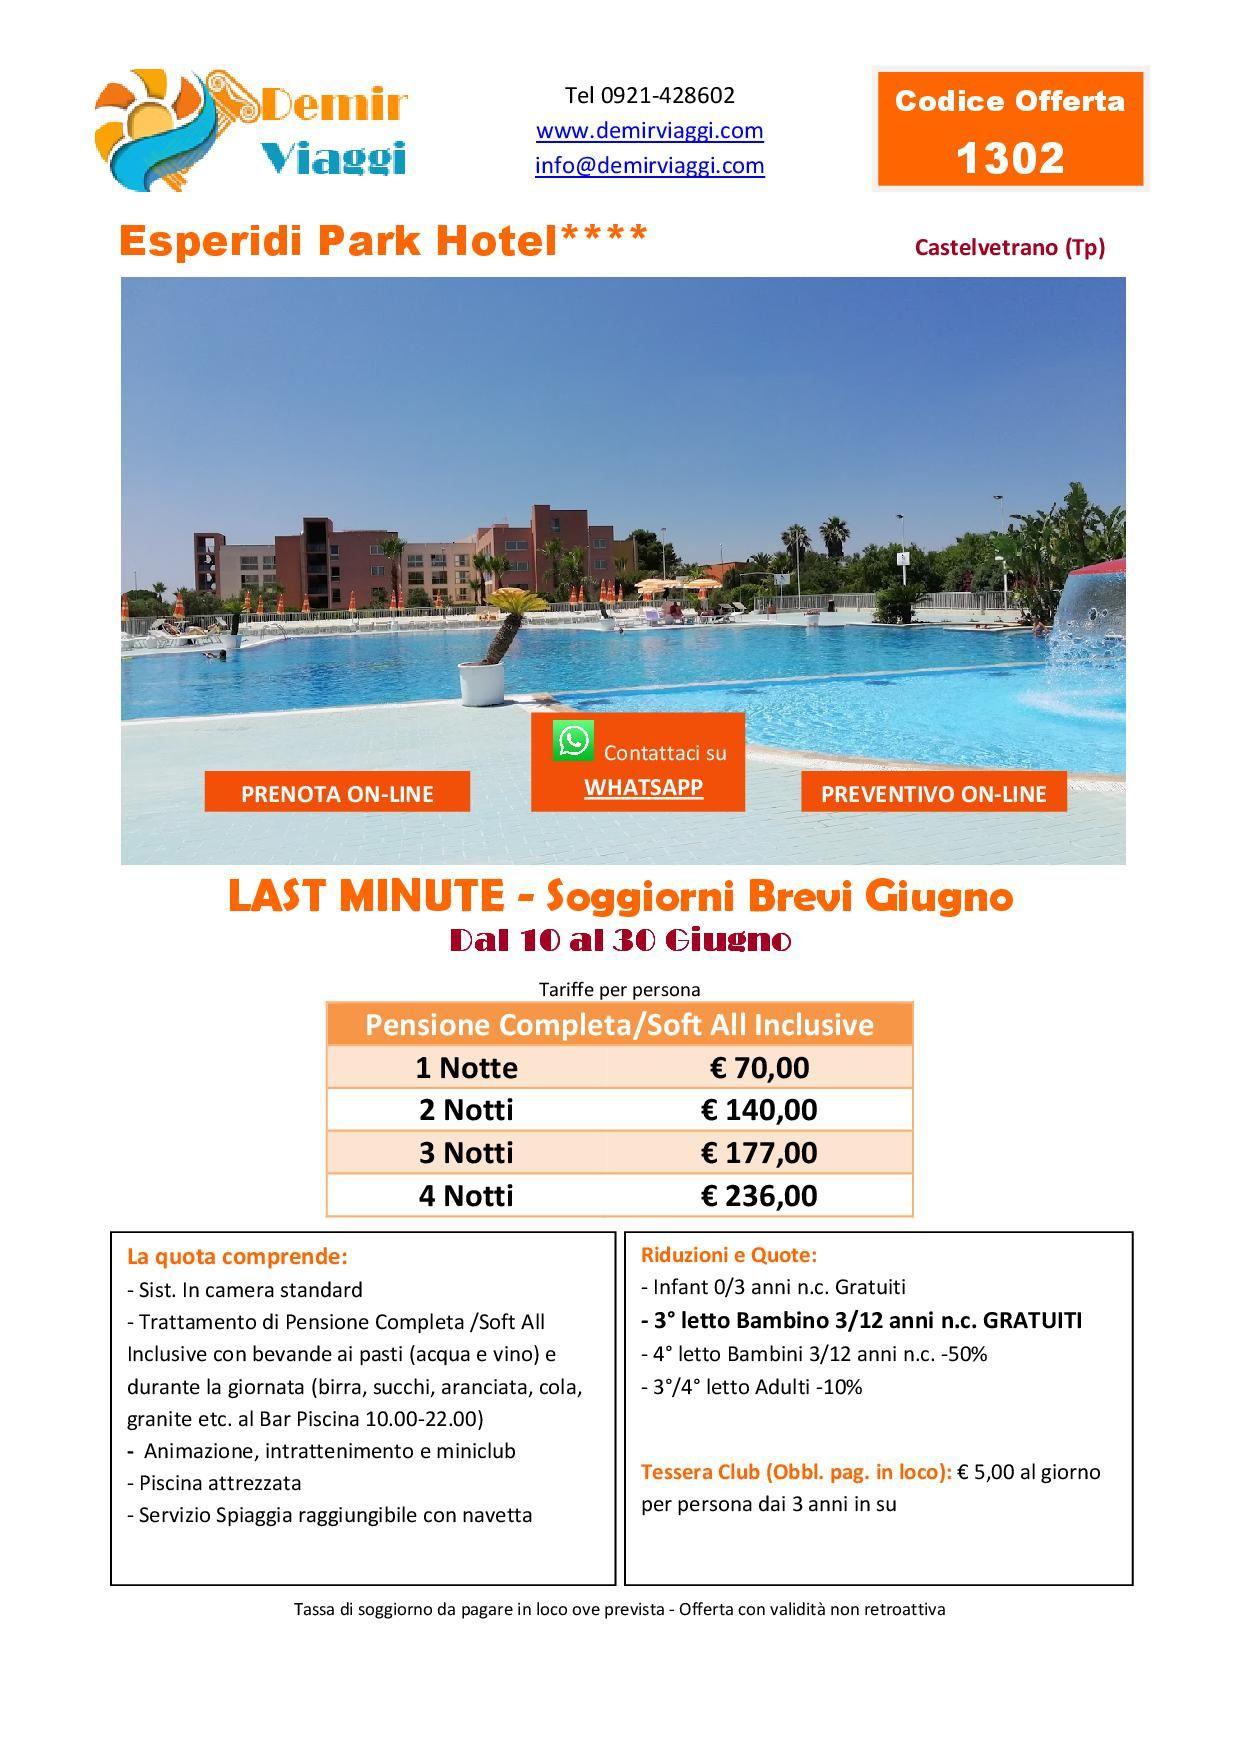 Esperidi Park Hotel**** - Castelvetrano (Tp) Last Minute ...